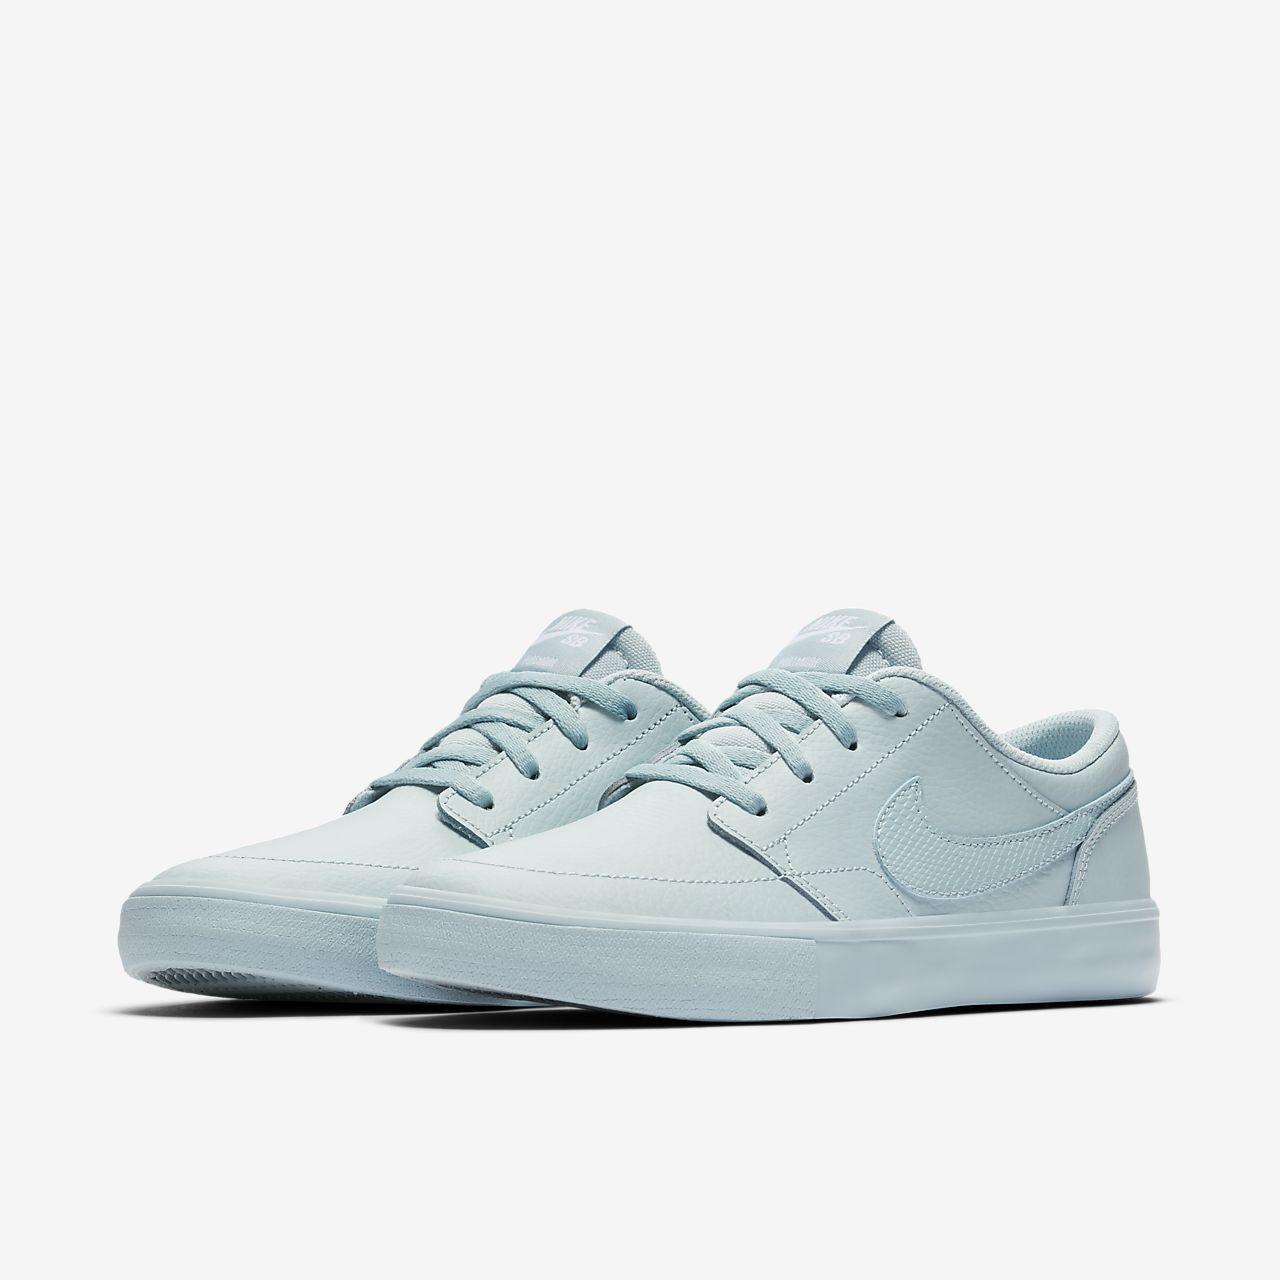 Nike SB Portmore II Women's Skateboarding Shoes Blue sJ7687R